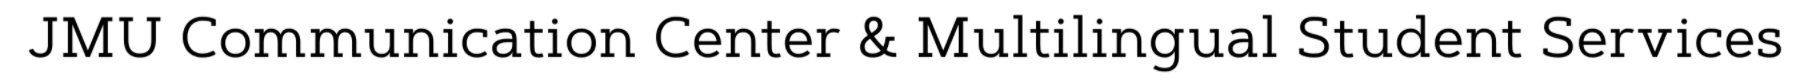 CommCenter/Multilingual Services Logo